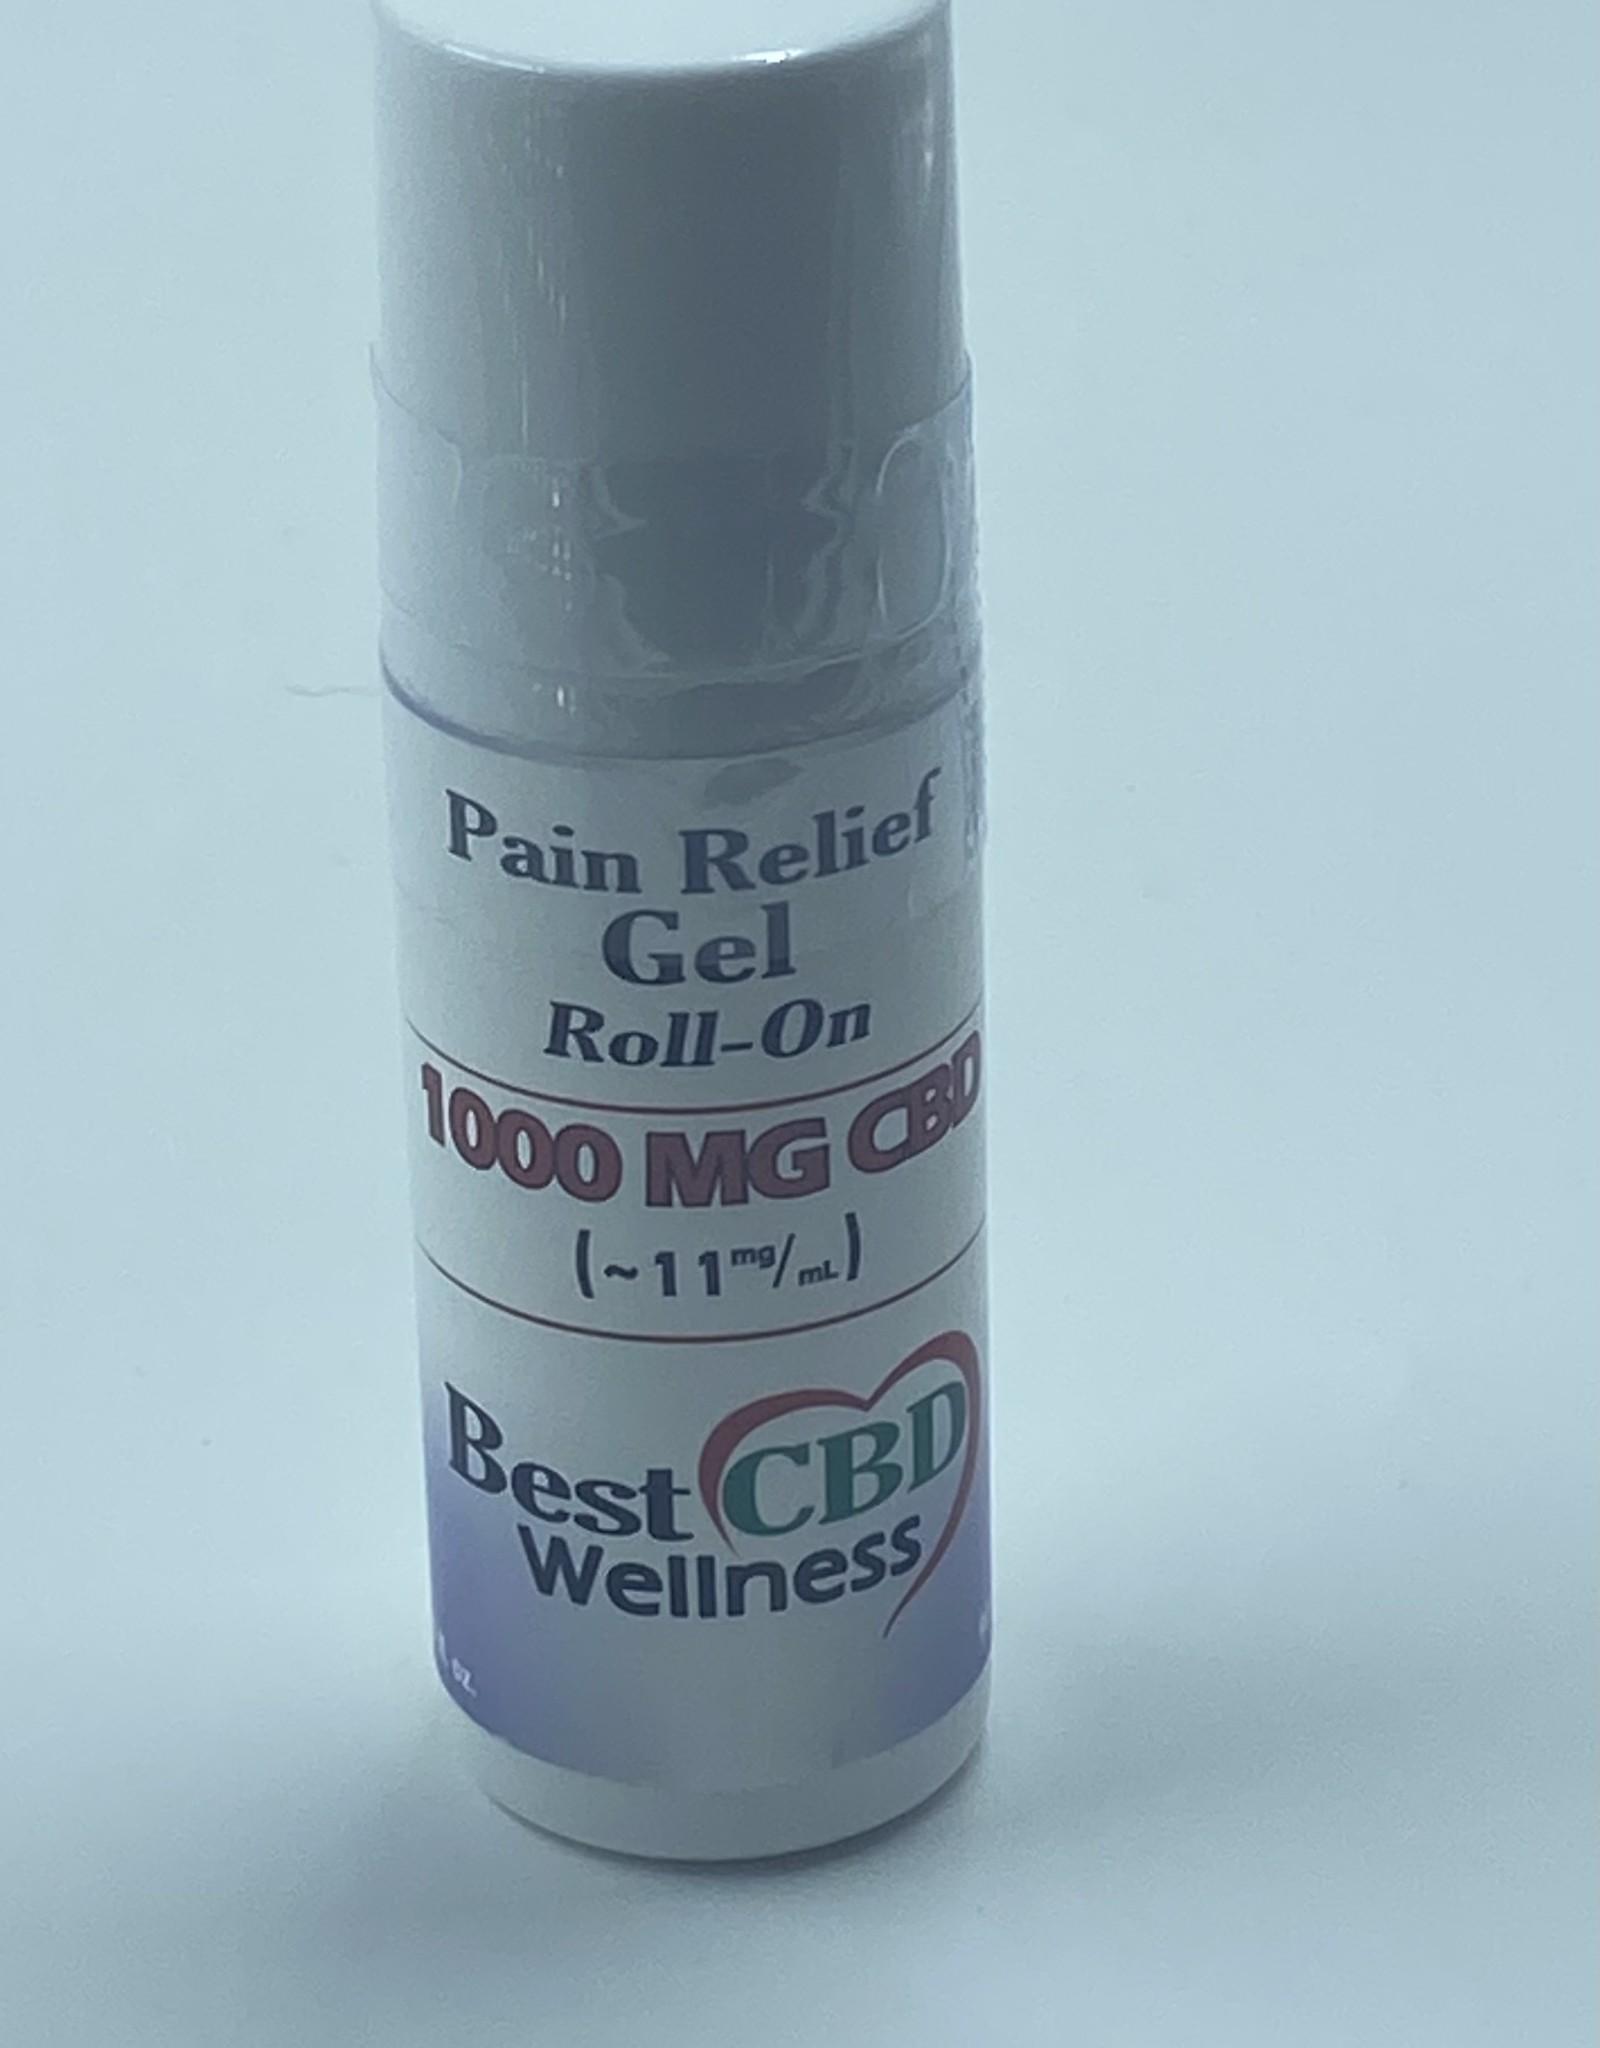 Best CBD Wellness Isolate CBD Roll-On Pain Relief Gel 1000mg 3oz